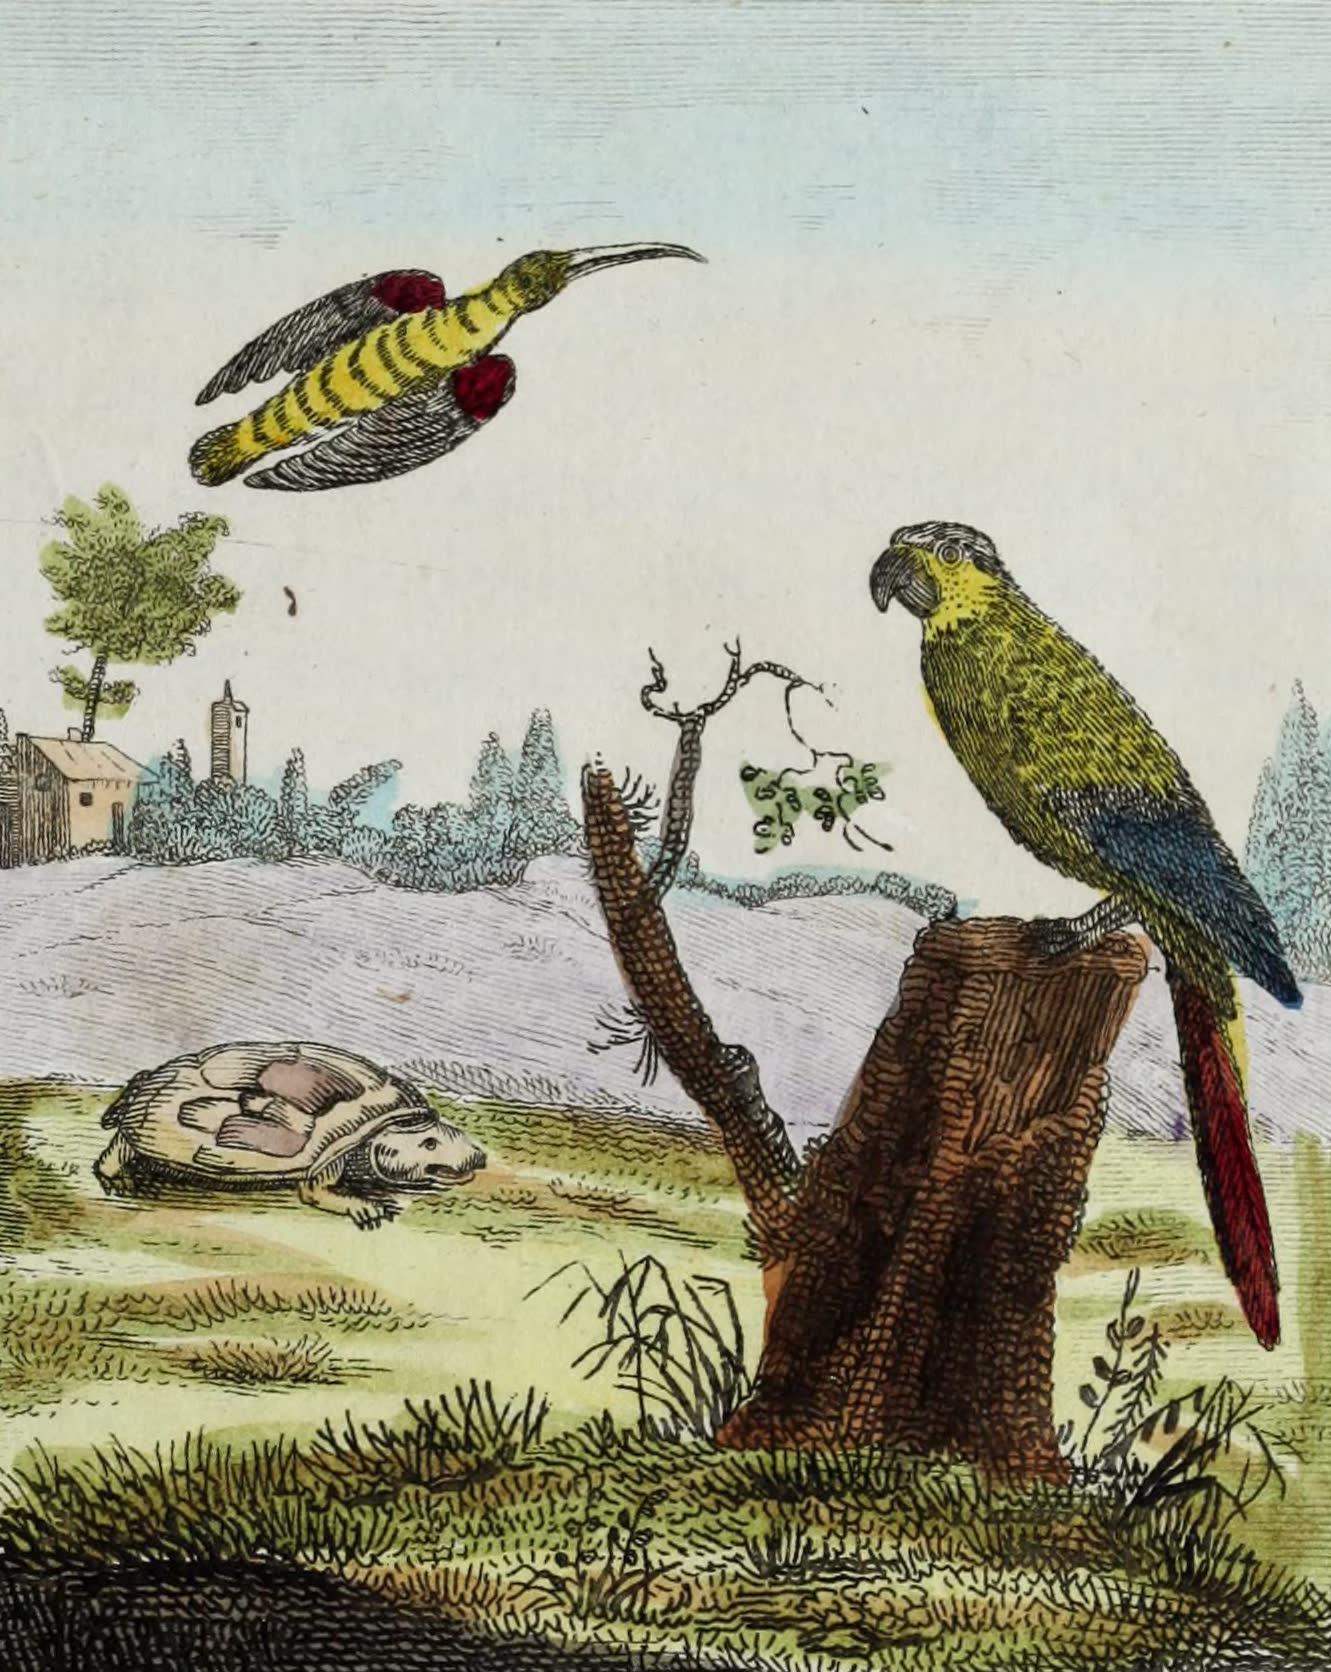 Le Colibri, la Tortue terrestre, l'Ara